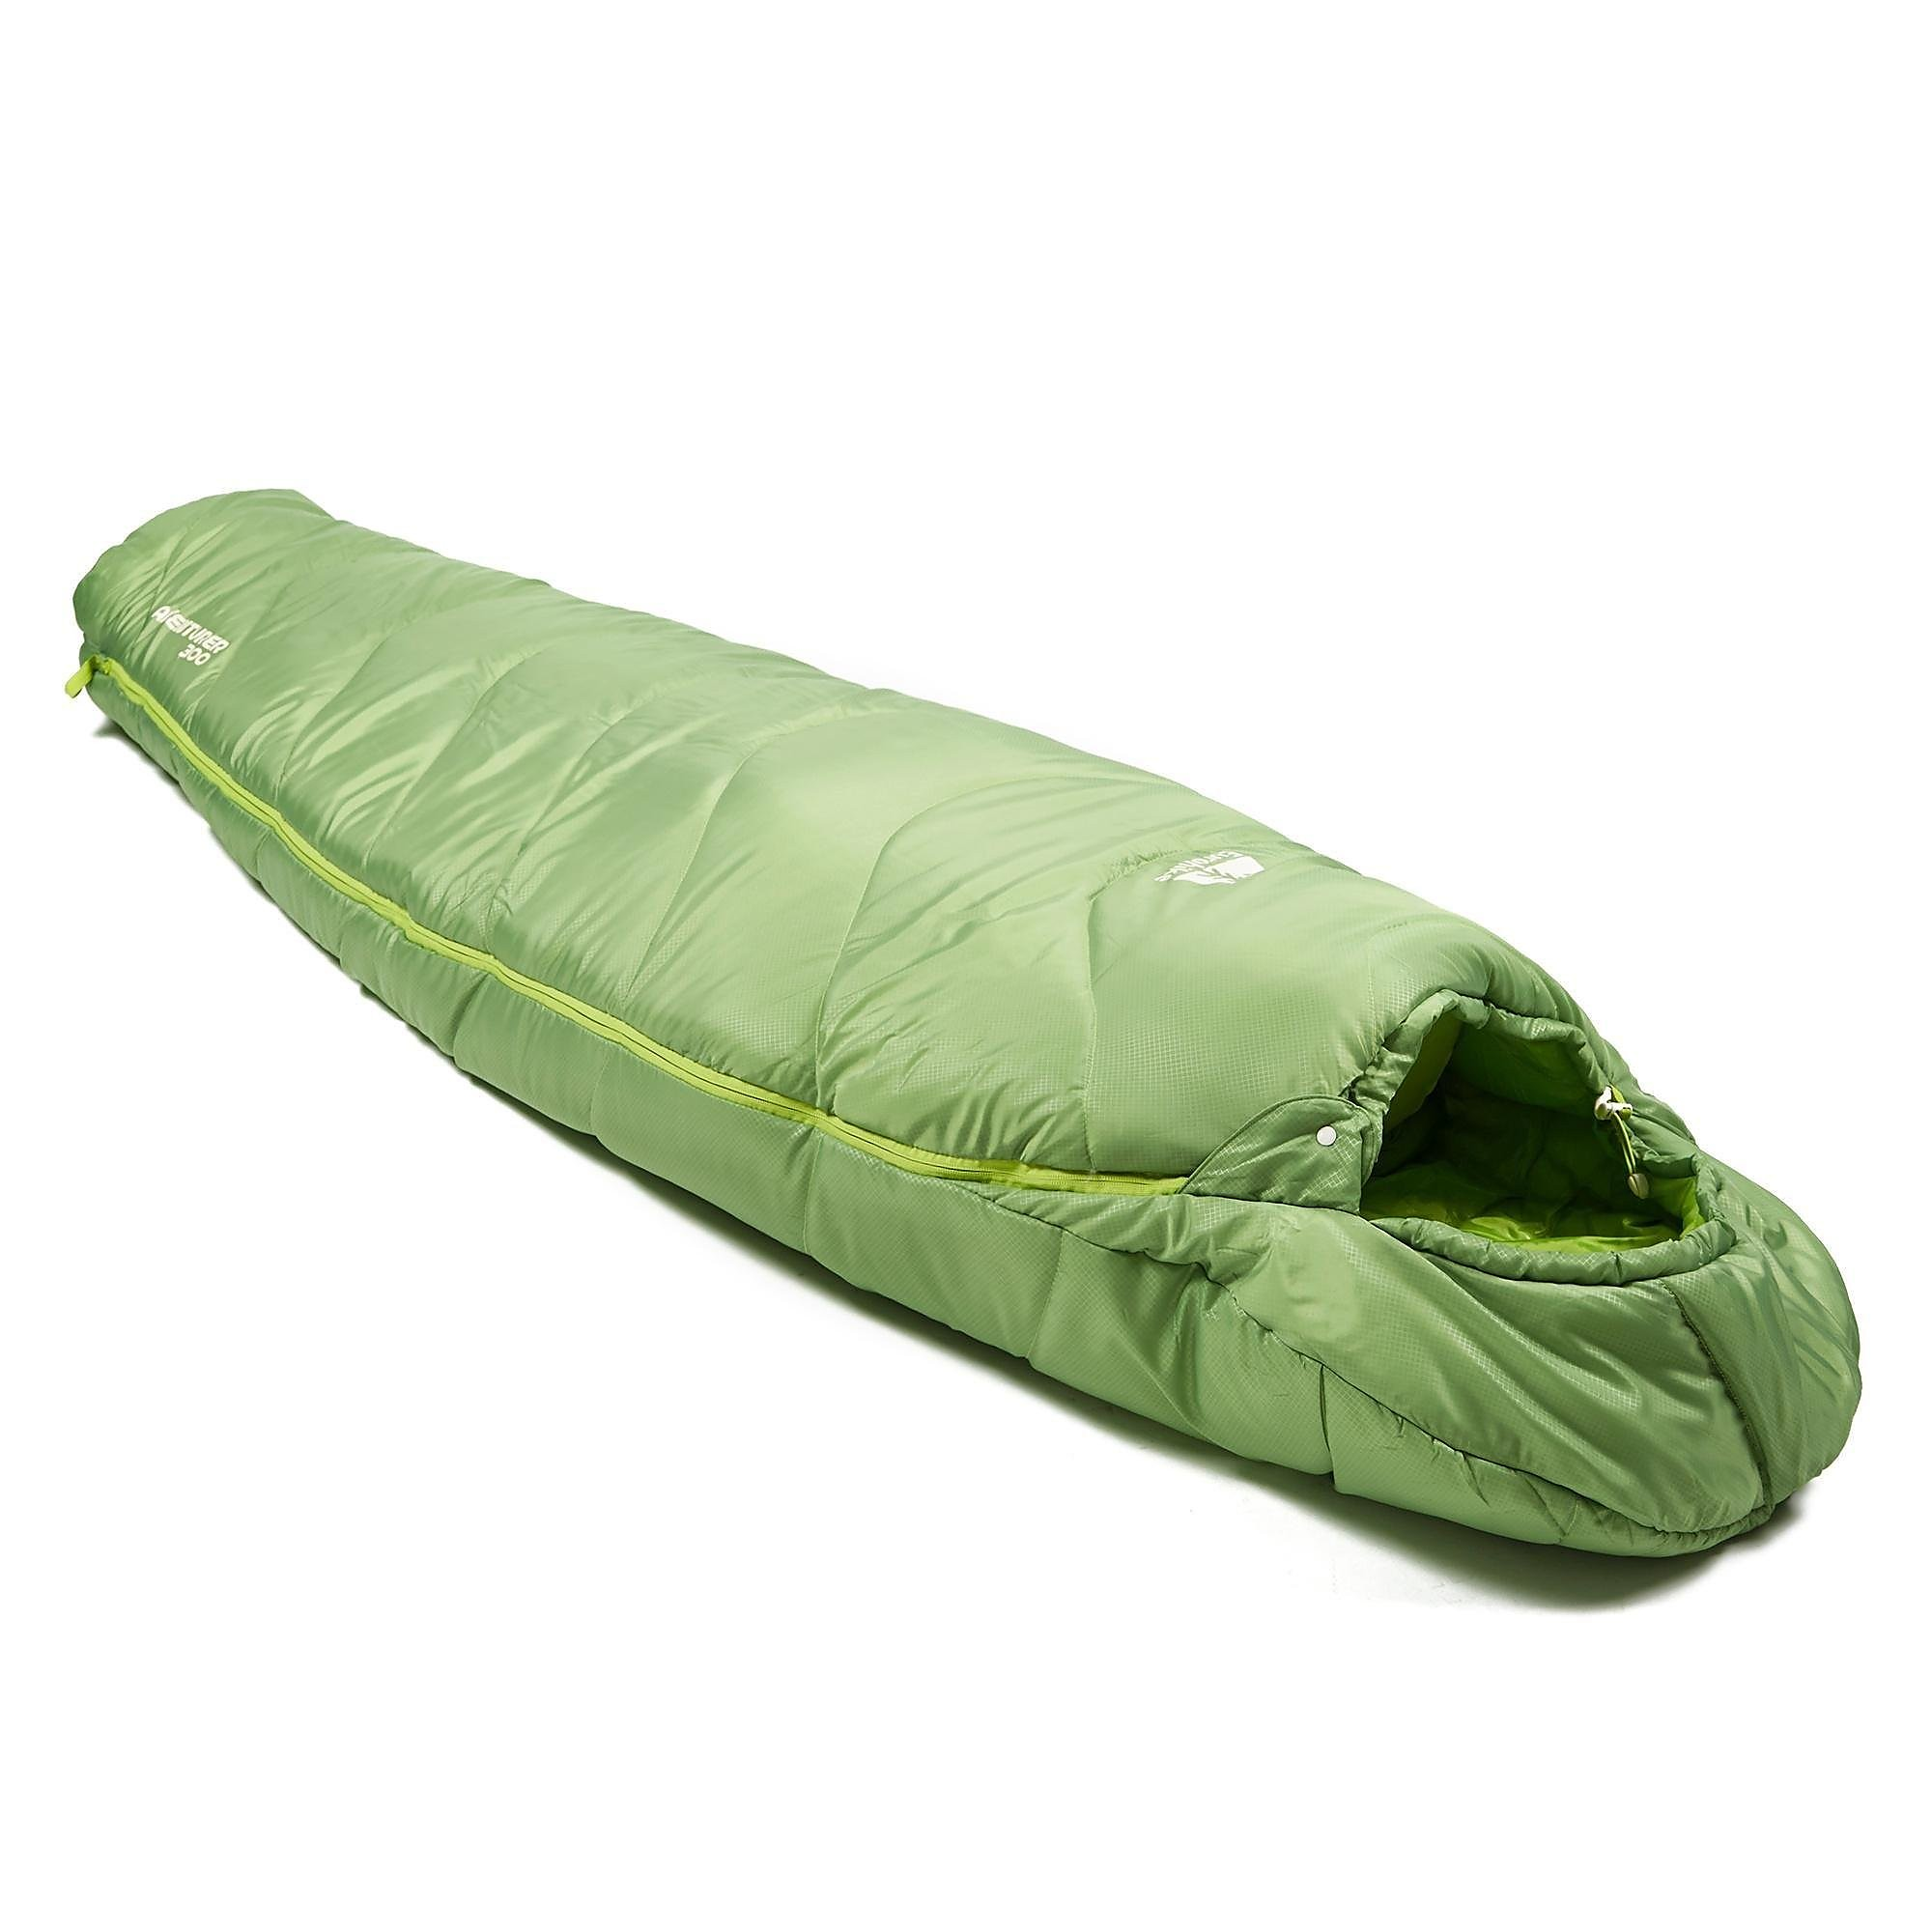 EUROHIKE Adventurer 300 Sleeping Bag